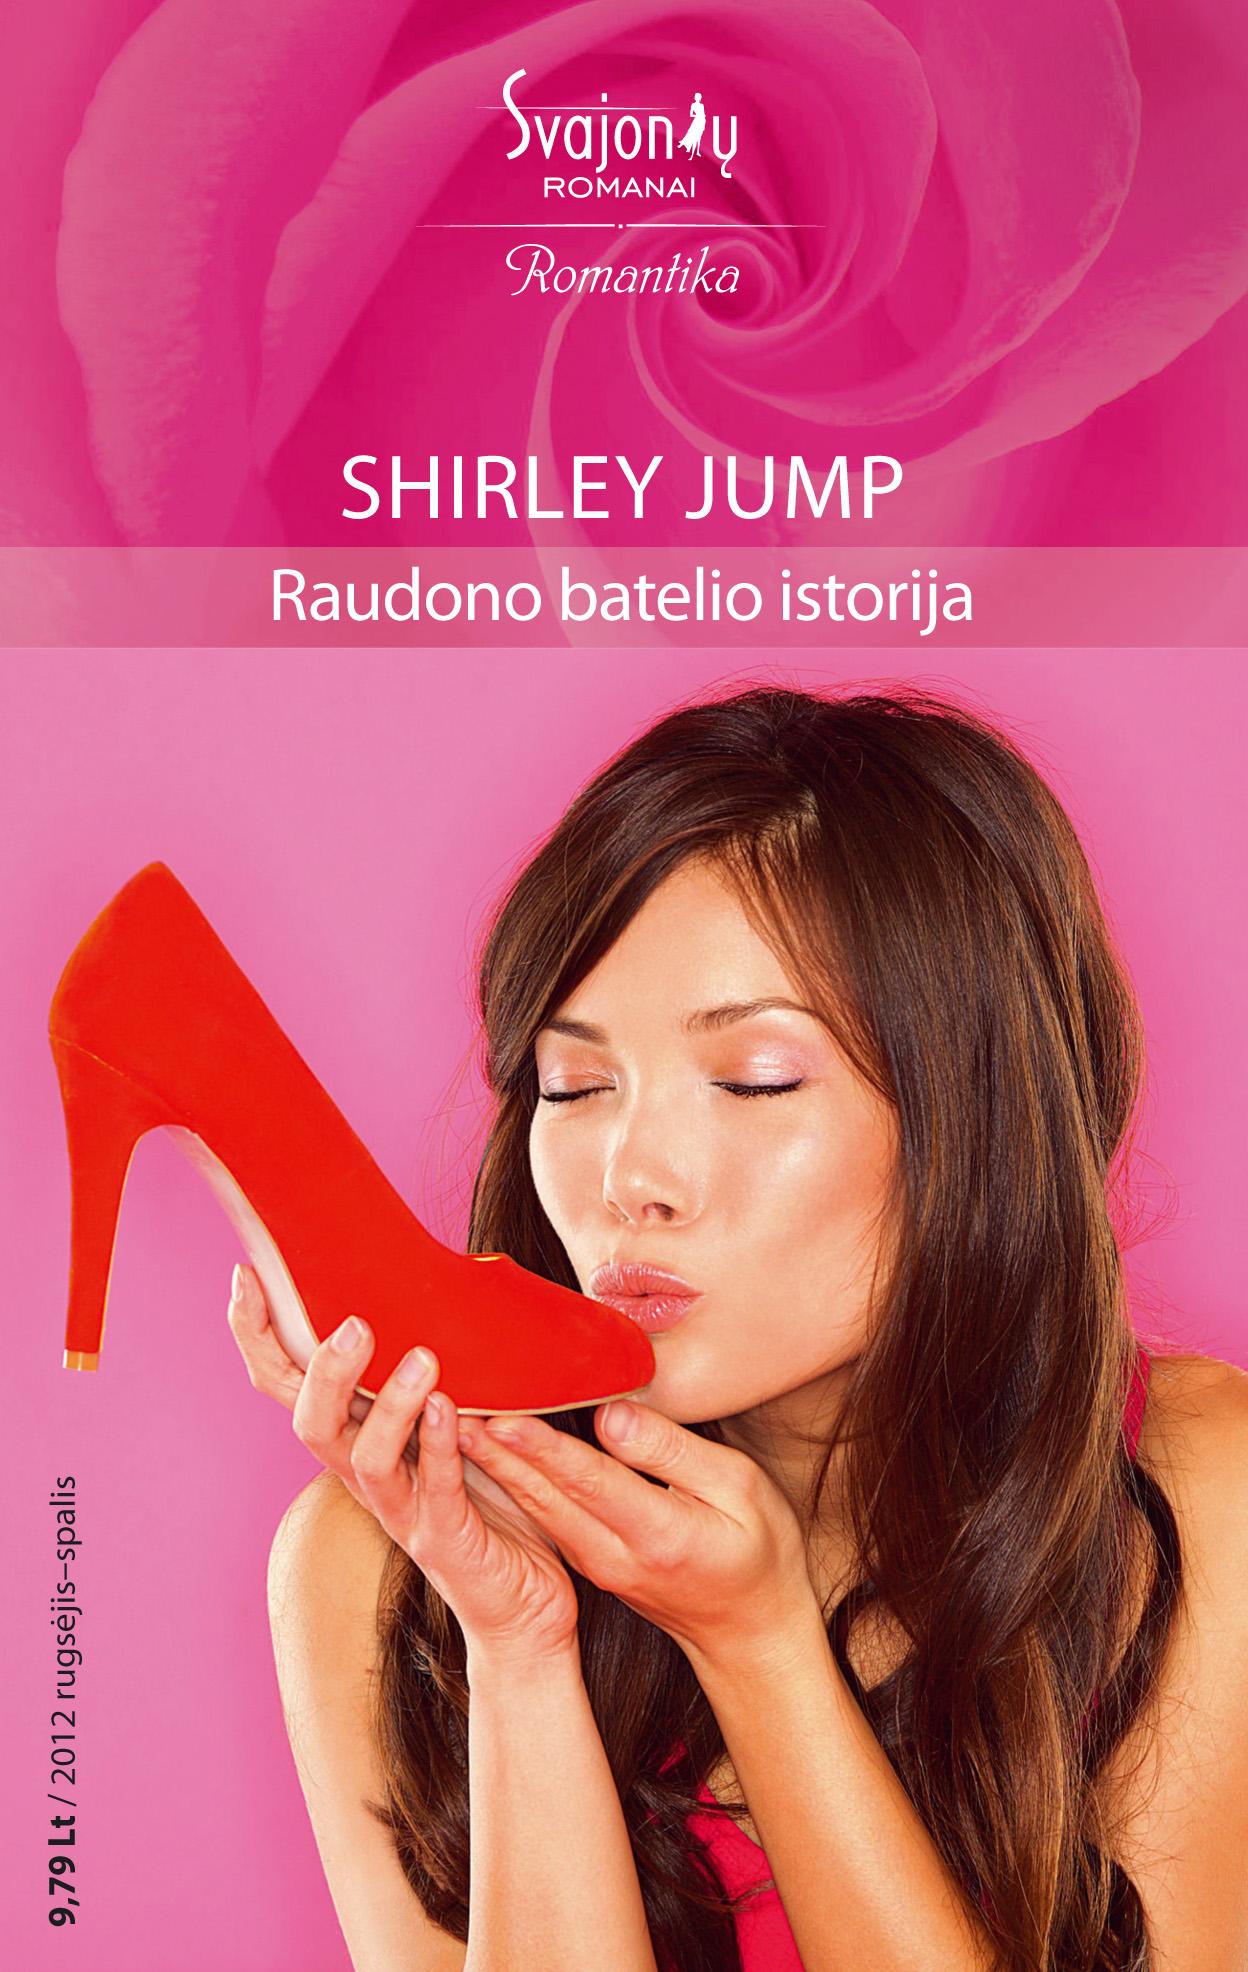 Shirley Jump Raudono batelio istorija